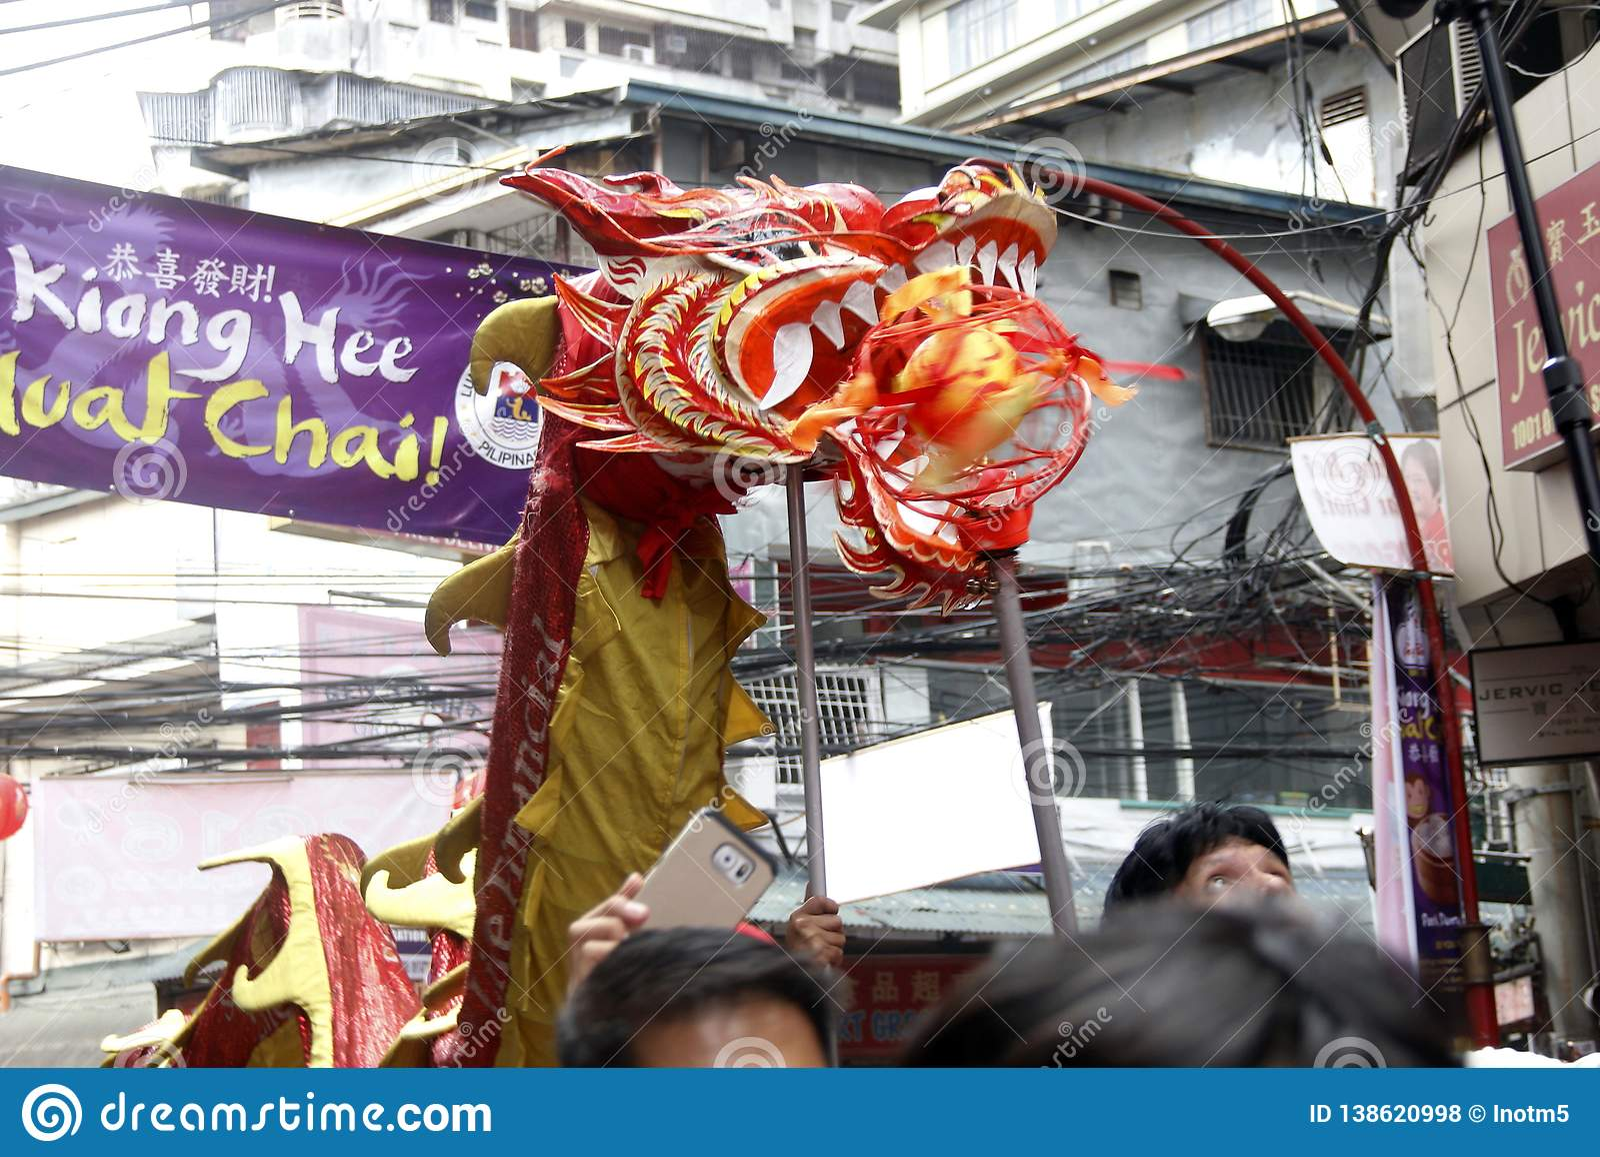 Nouvelle année chinoise à Manille Chinatown